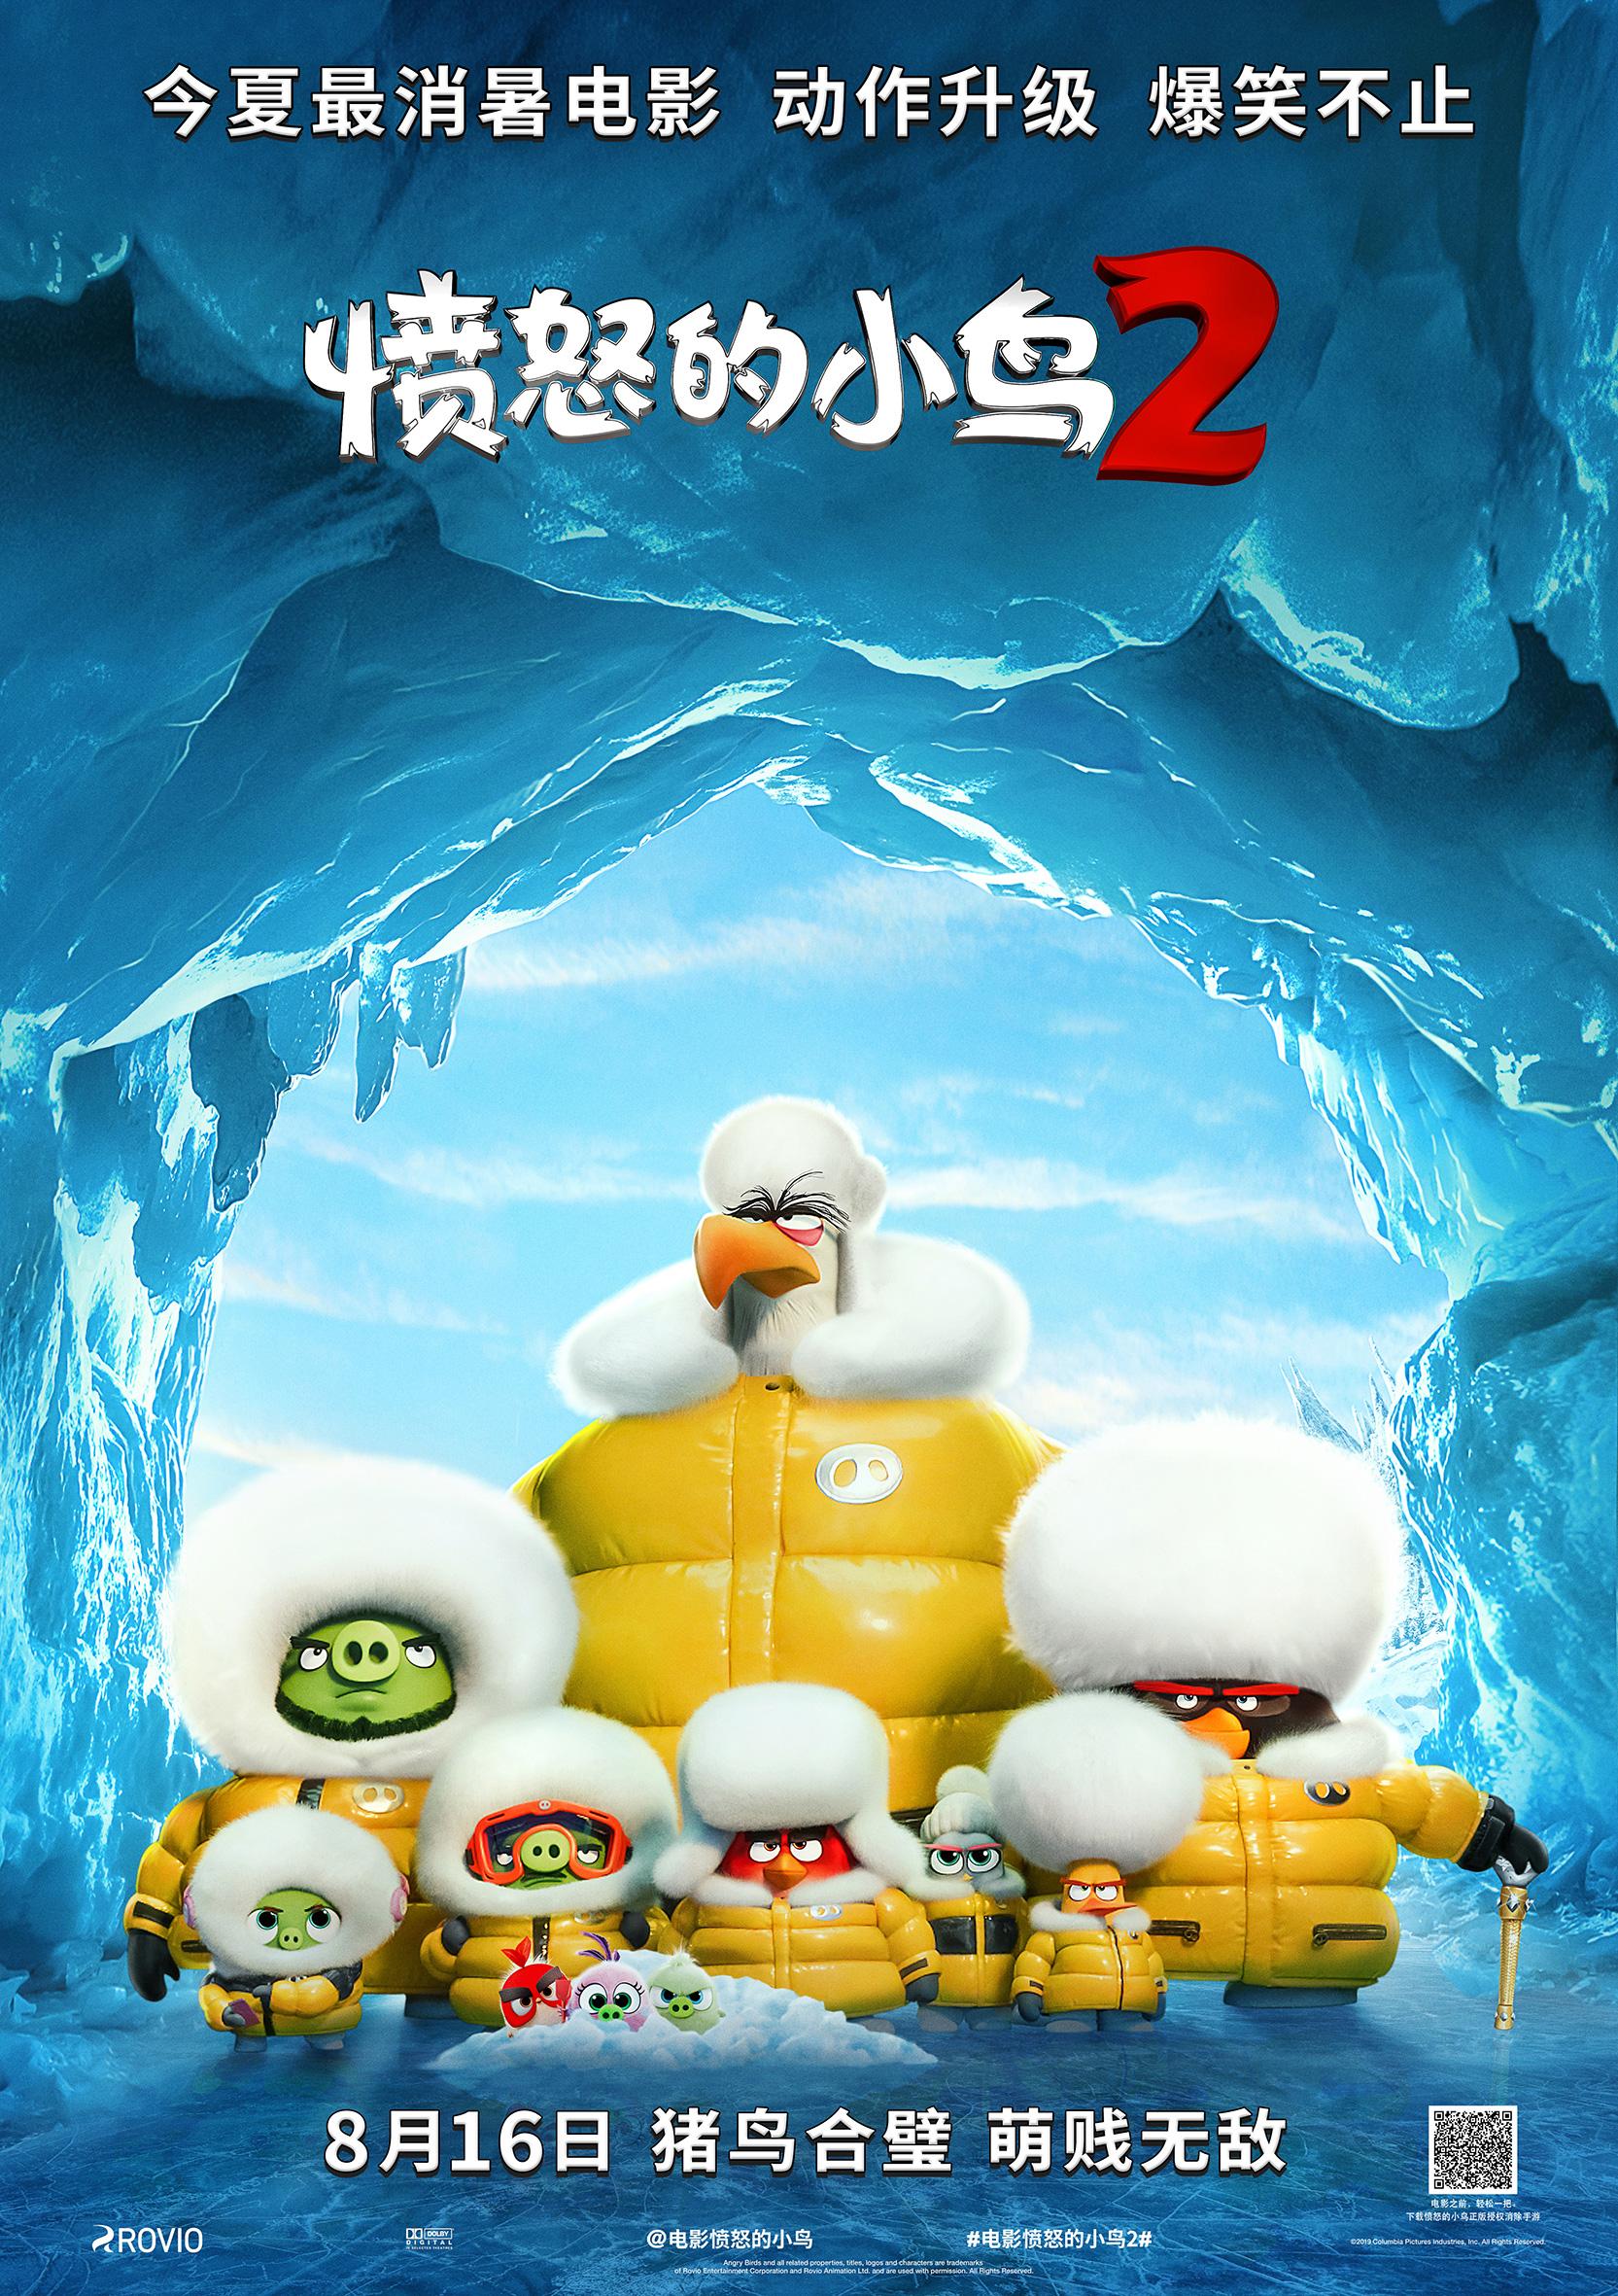 http://www.vribl.com/xingzuo/577831.html